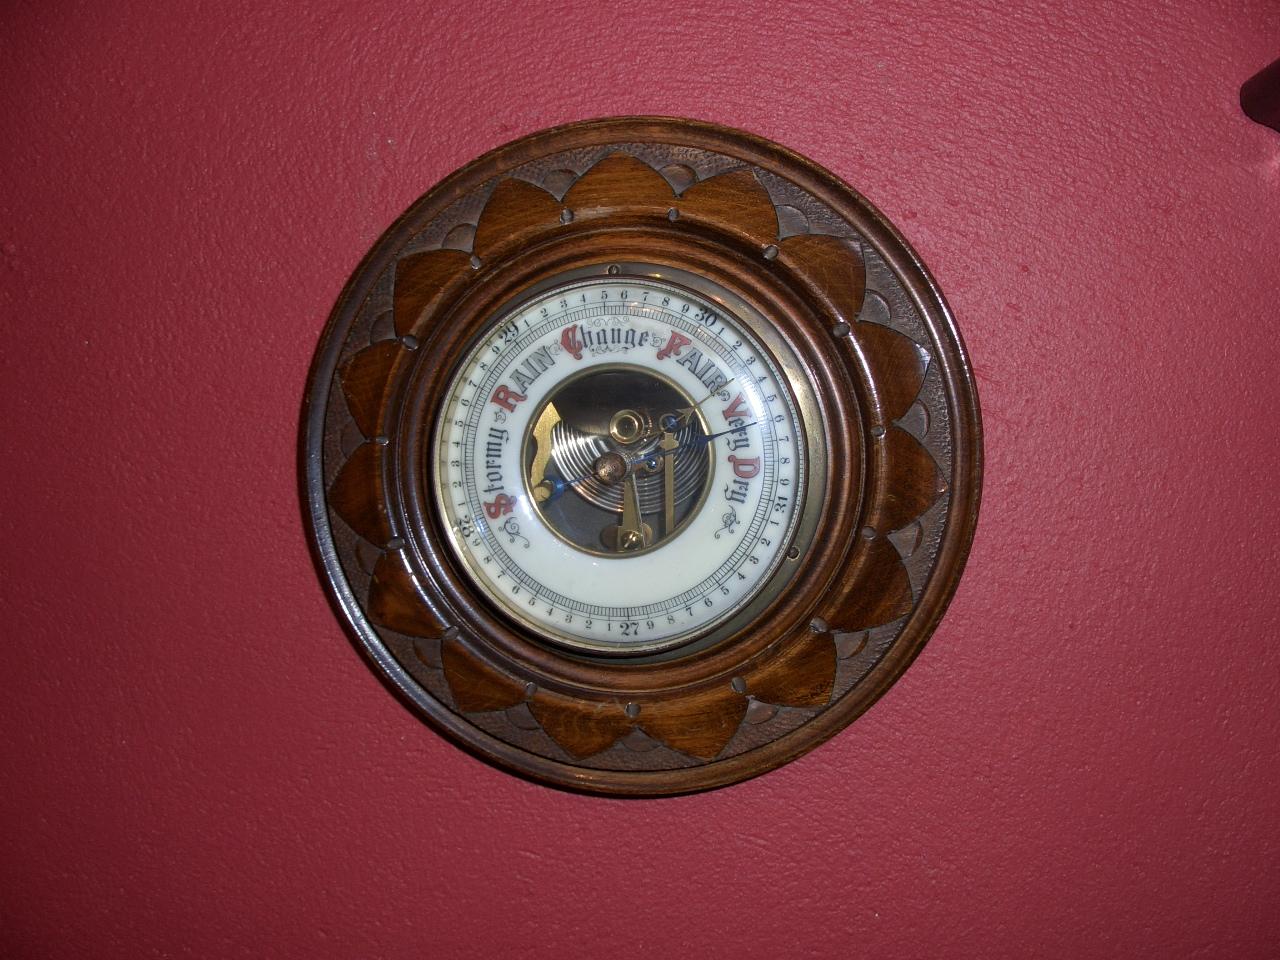 Edwardian Aneroid barometer – SOLD